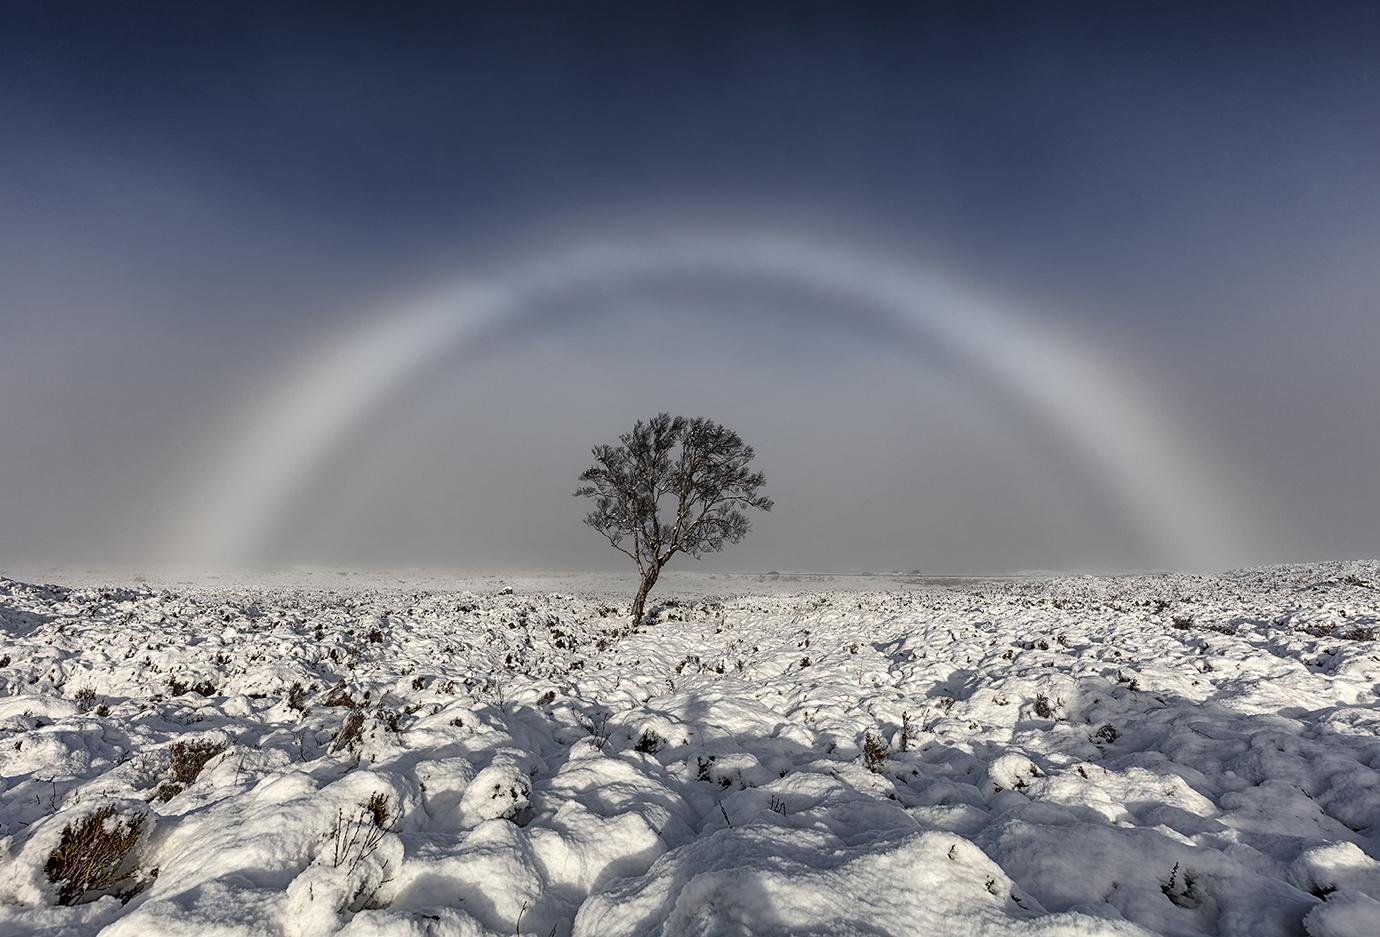 Fogbow, Rannoch Moor, Scotland